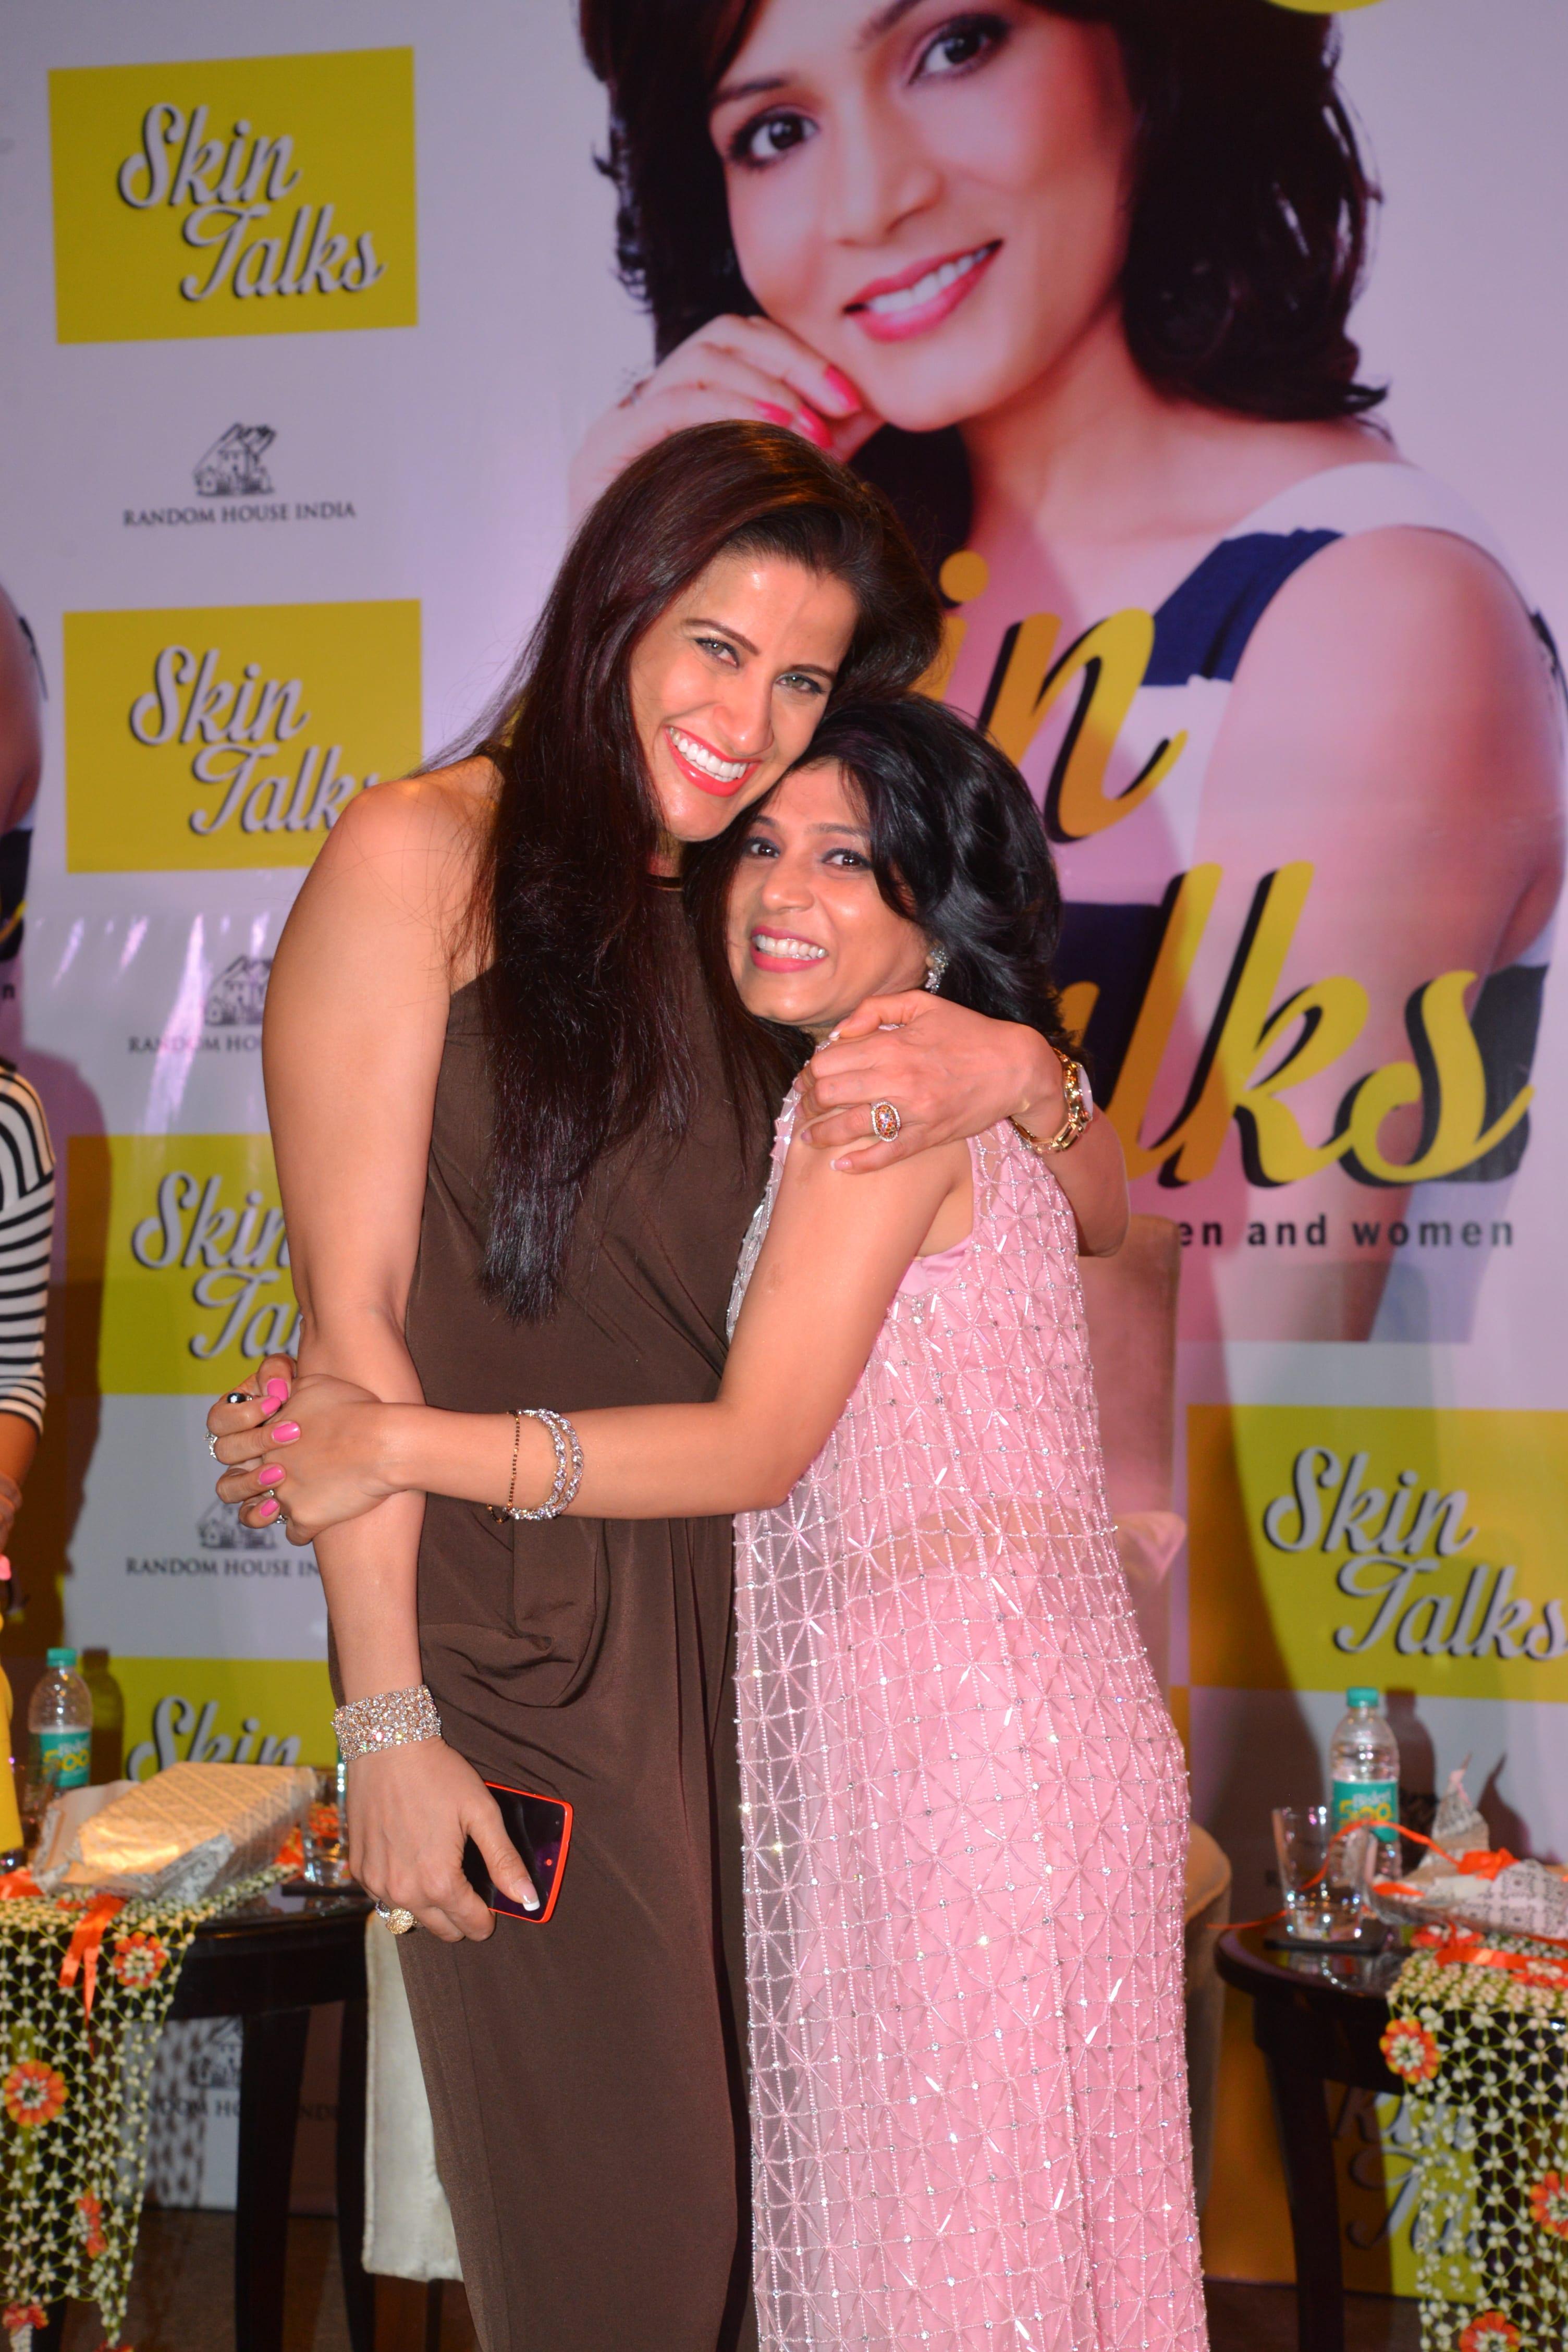 With the lovely Yasmin Karachiwala